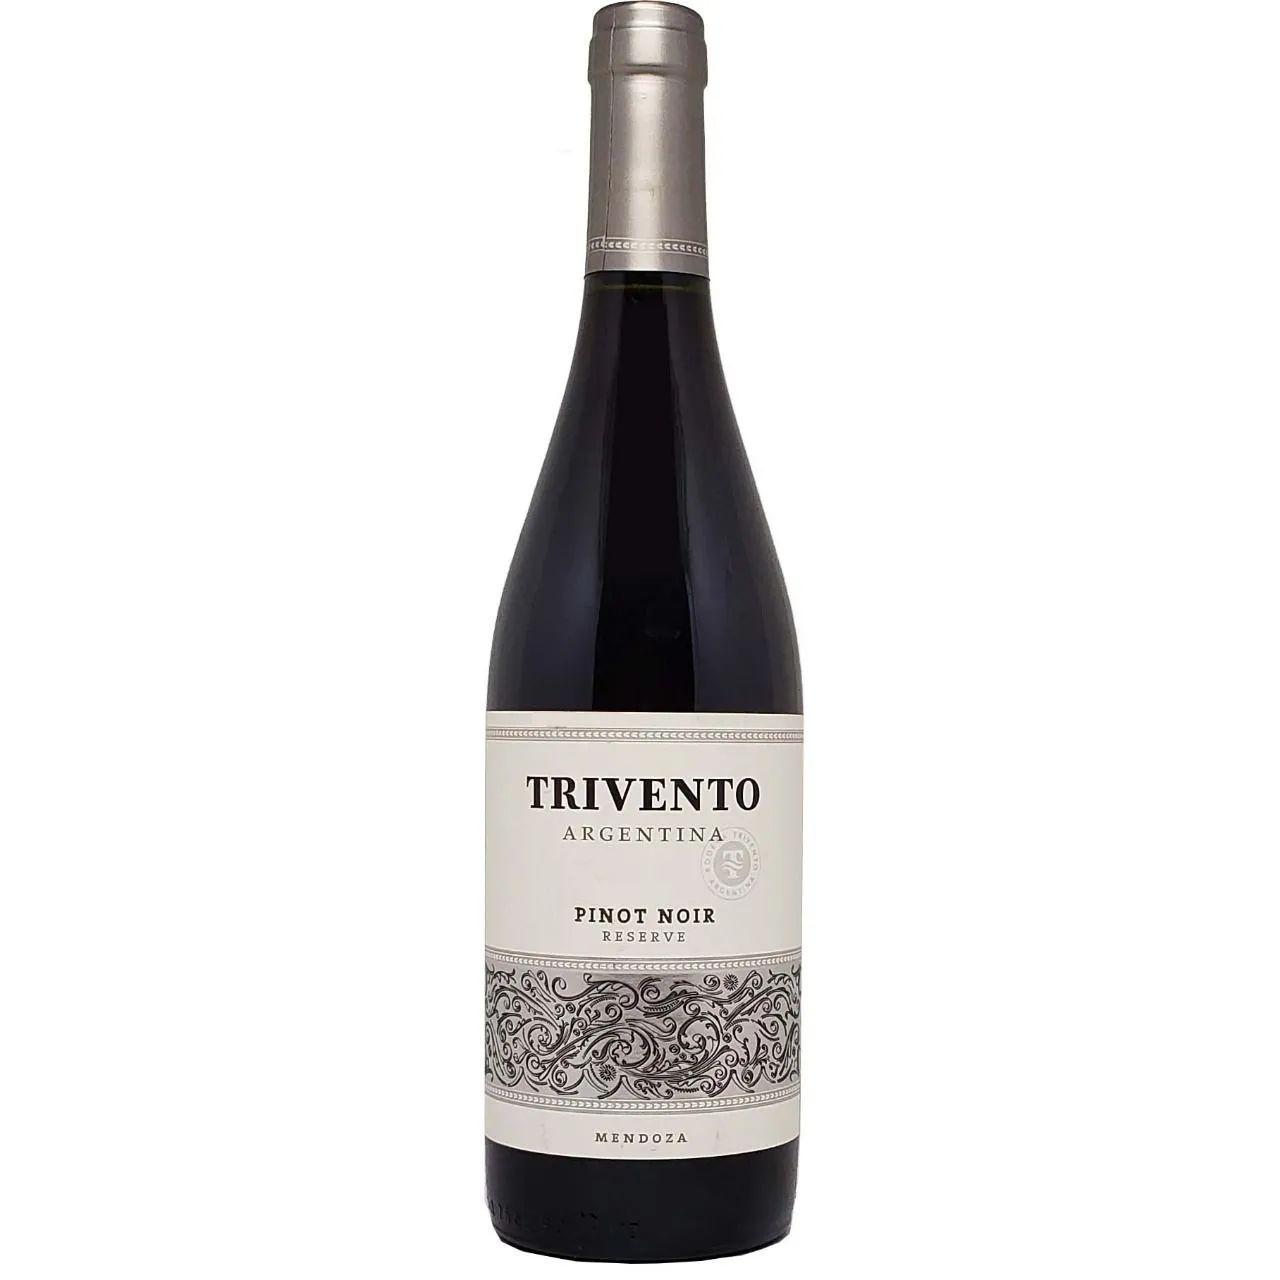 VINHO TRIVENTO PINOT NOIR RESERVE 750 ML